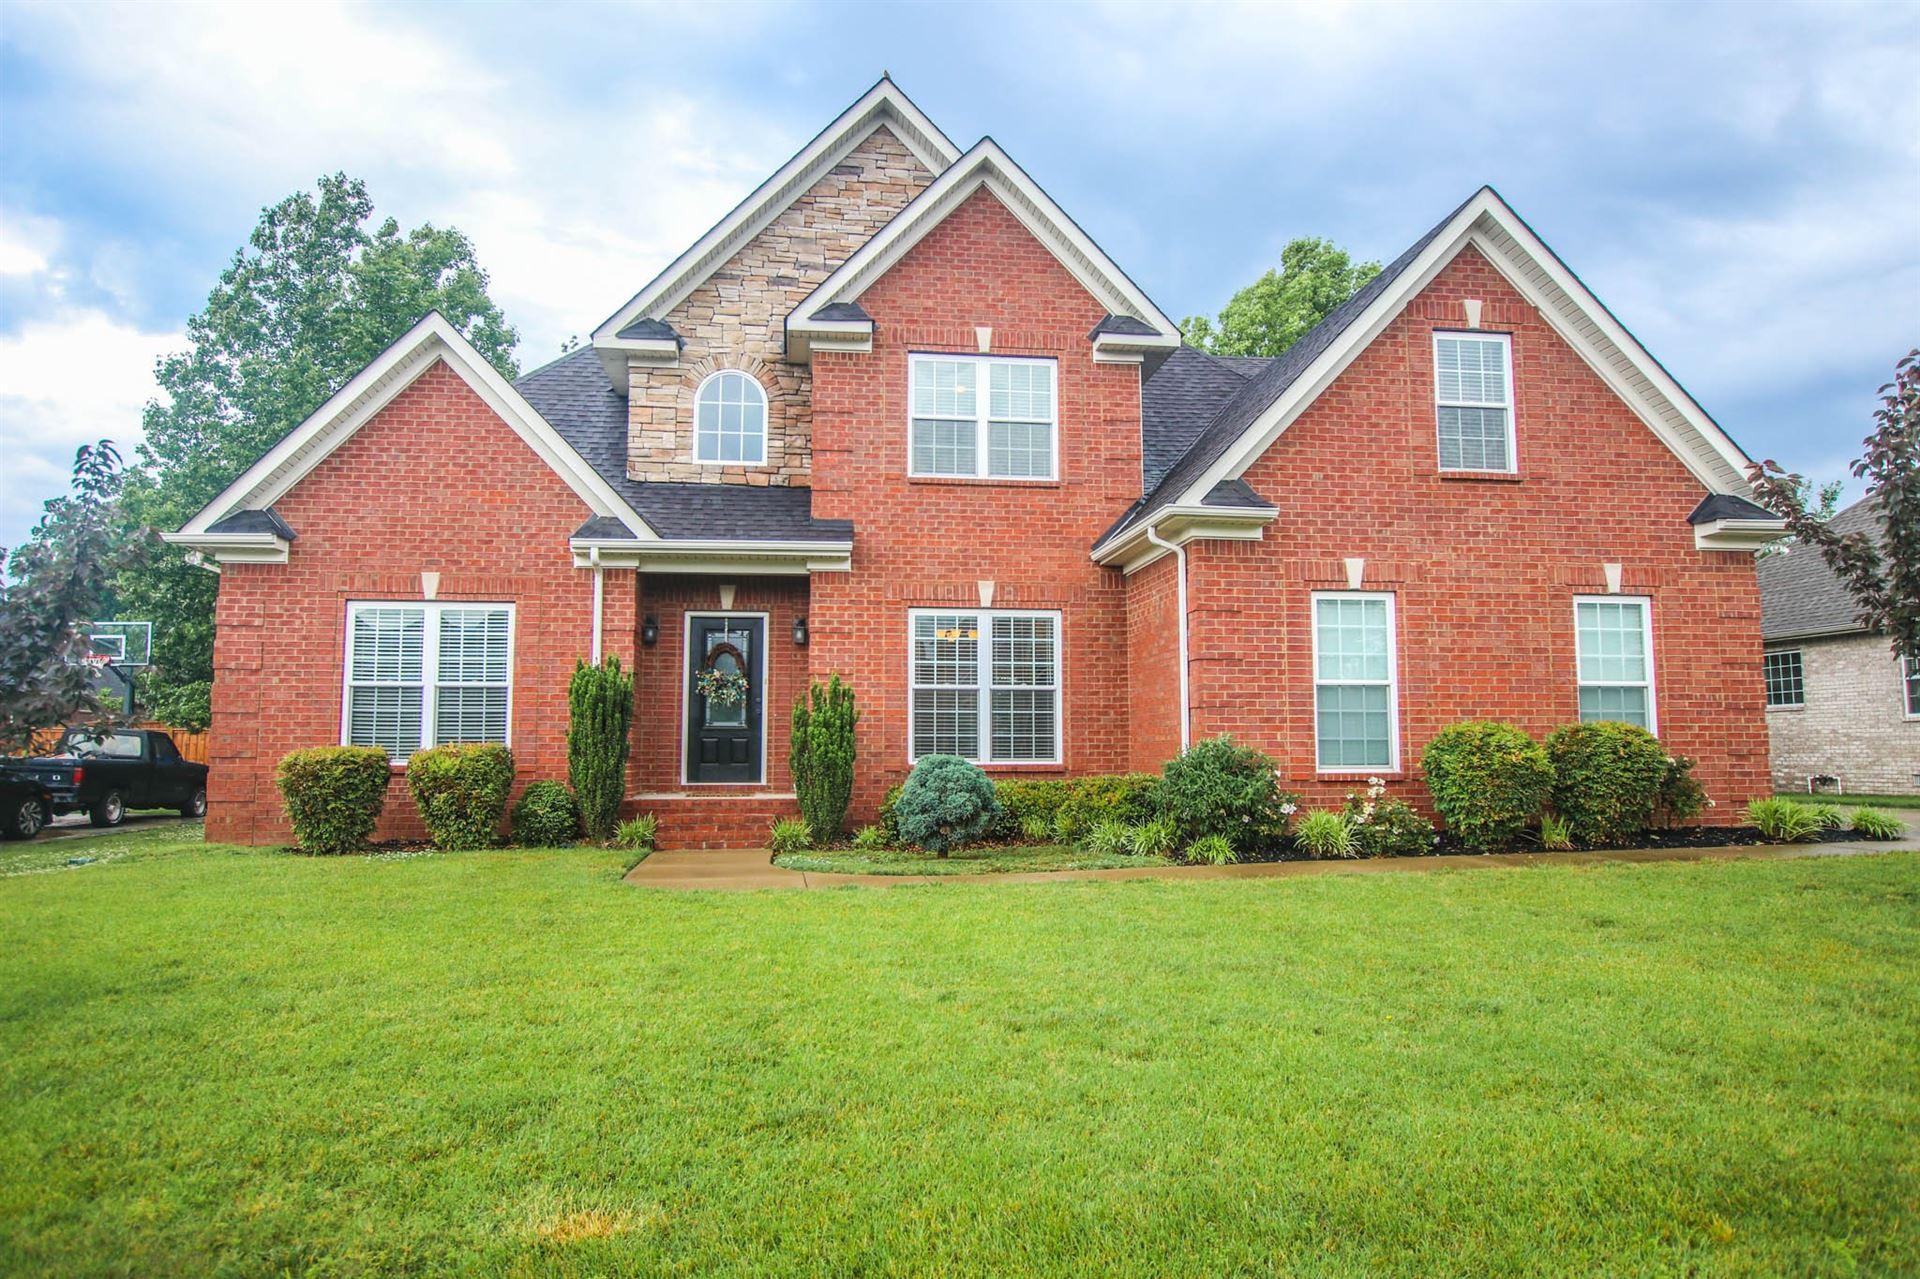 543 Schroer Drive, Murfreesboro, TN 37128 - MLS#: 2259596